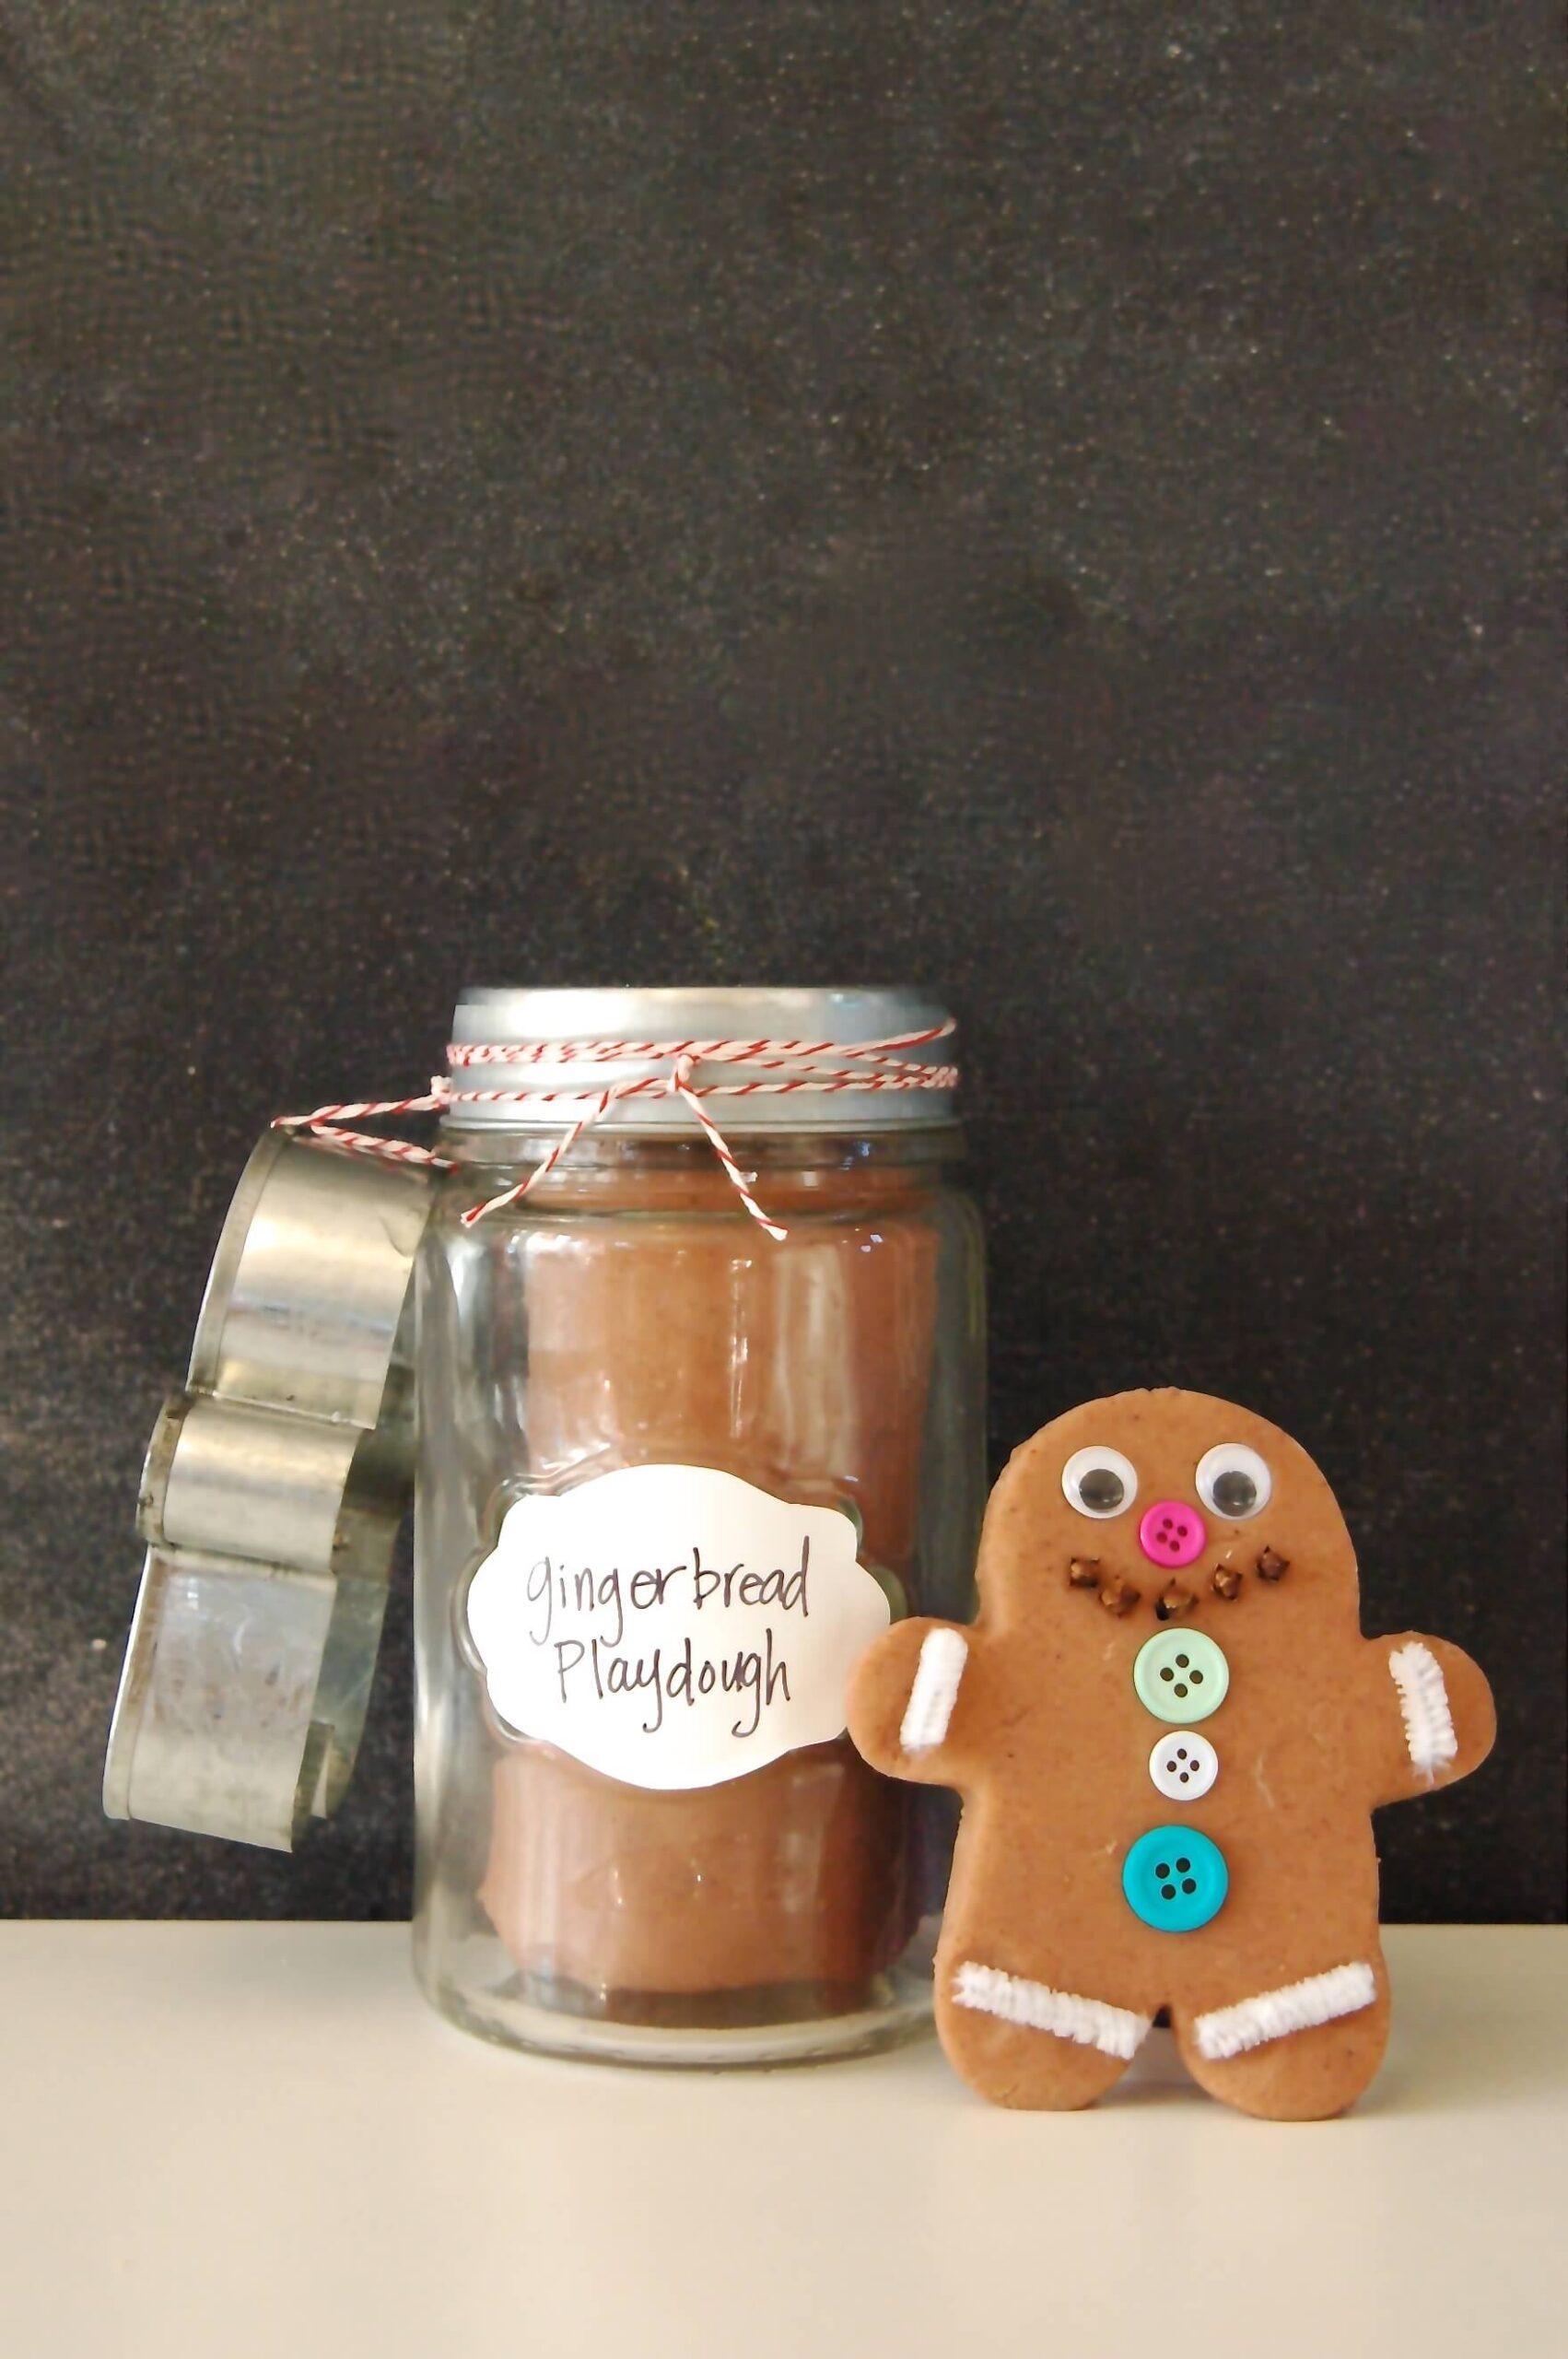 Gingerbread Man in a Jar